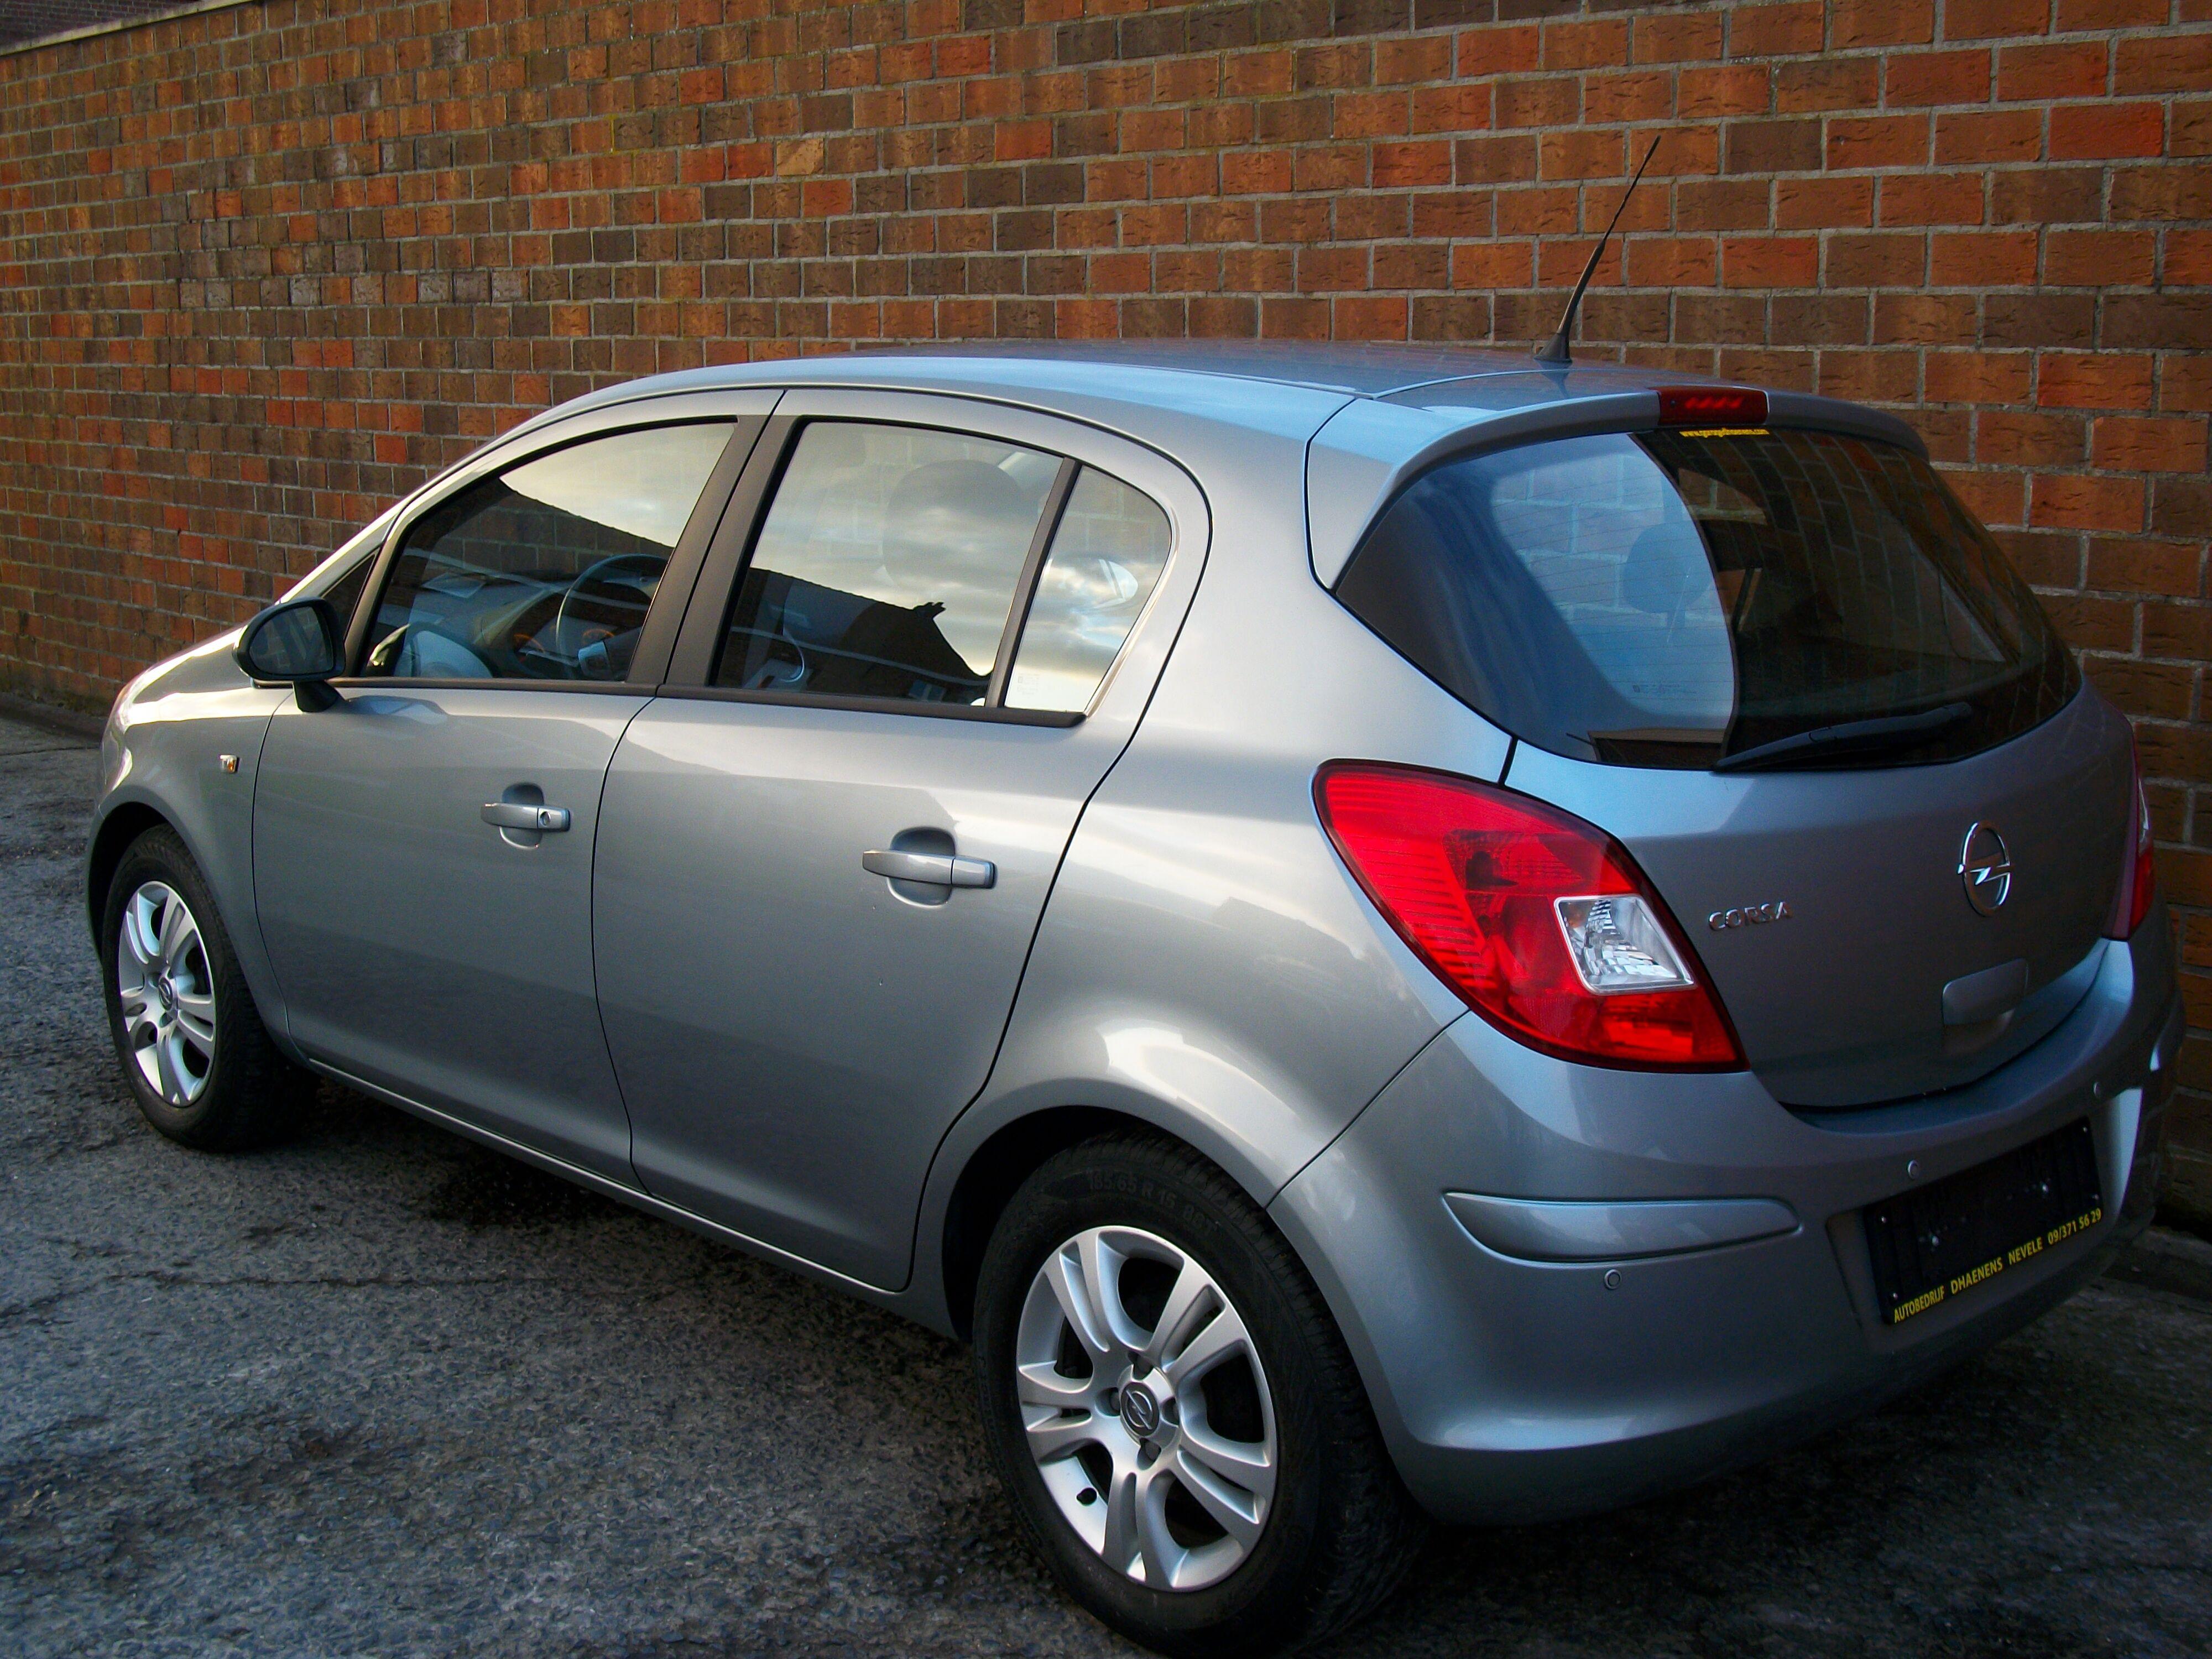 Opel CORSA - 2011 1.2 Benz - weinig kilometers 2/11